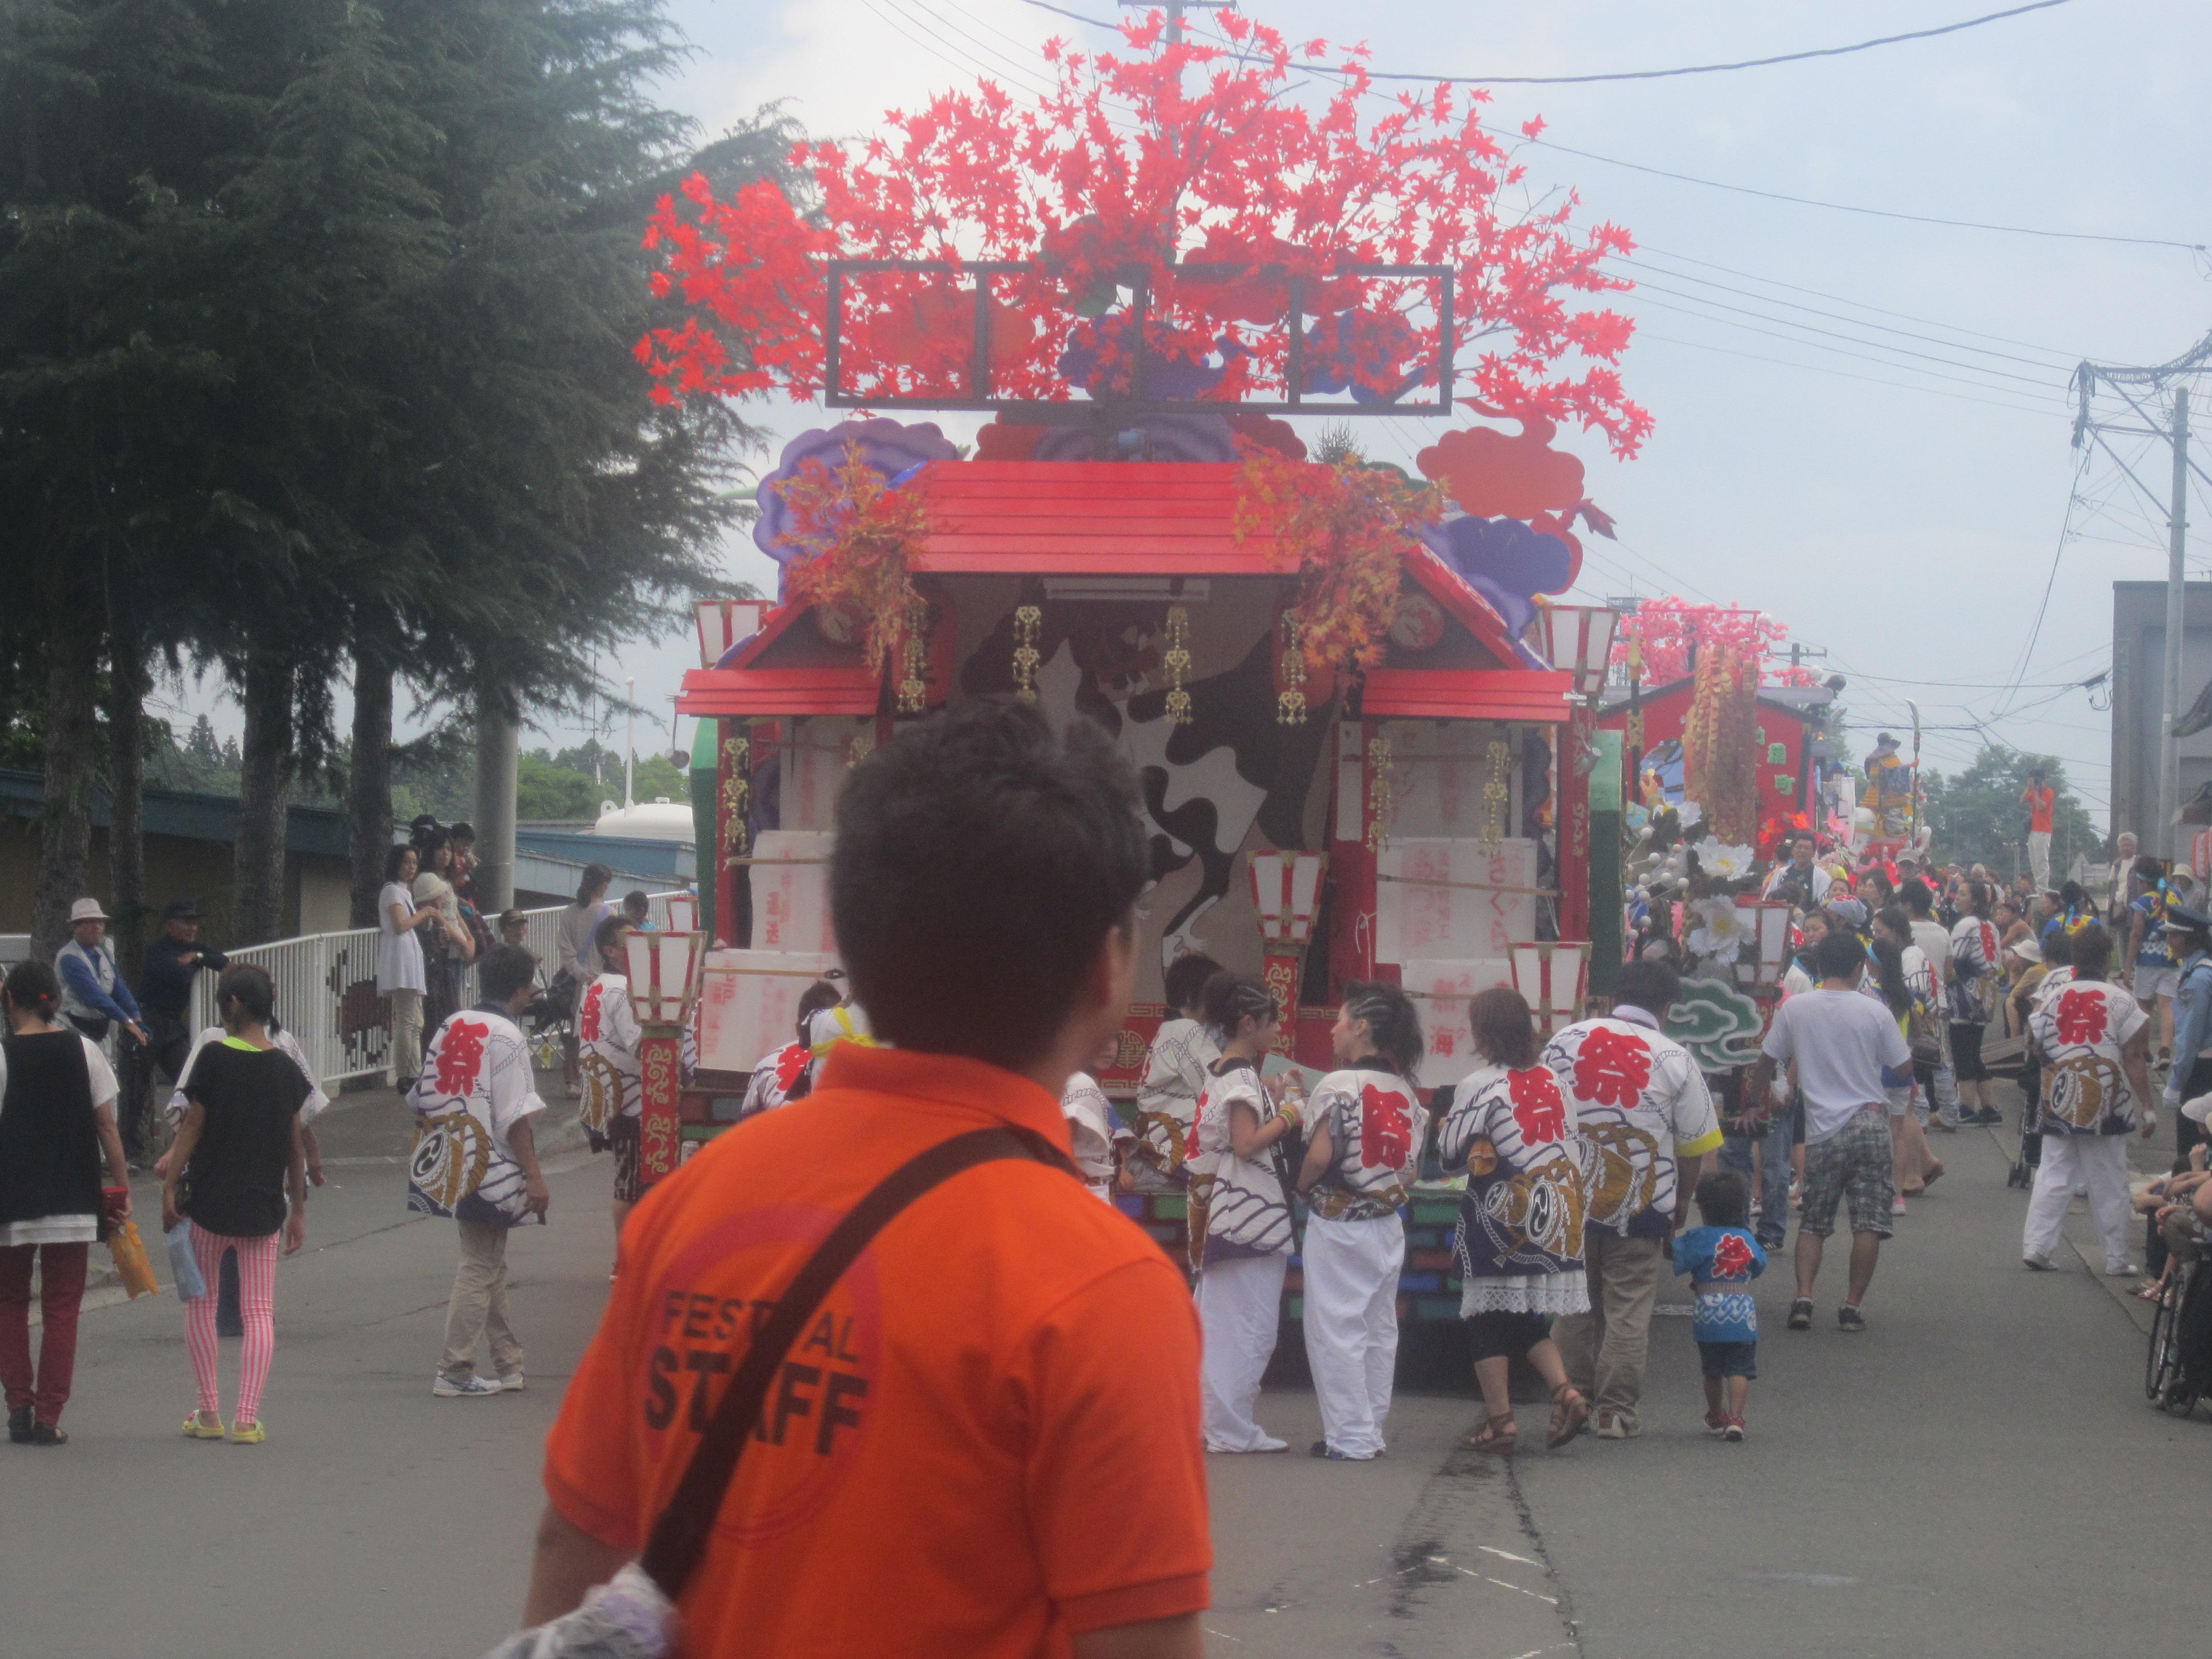 IMG 4251 - 麻布十番納涼祭り25,26日(七戸町出店)